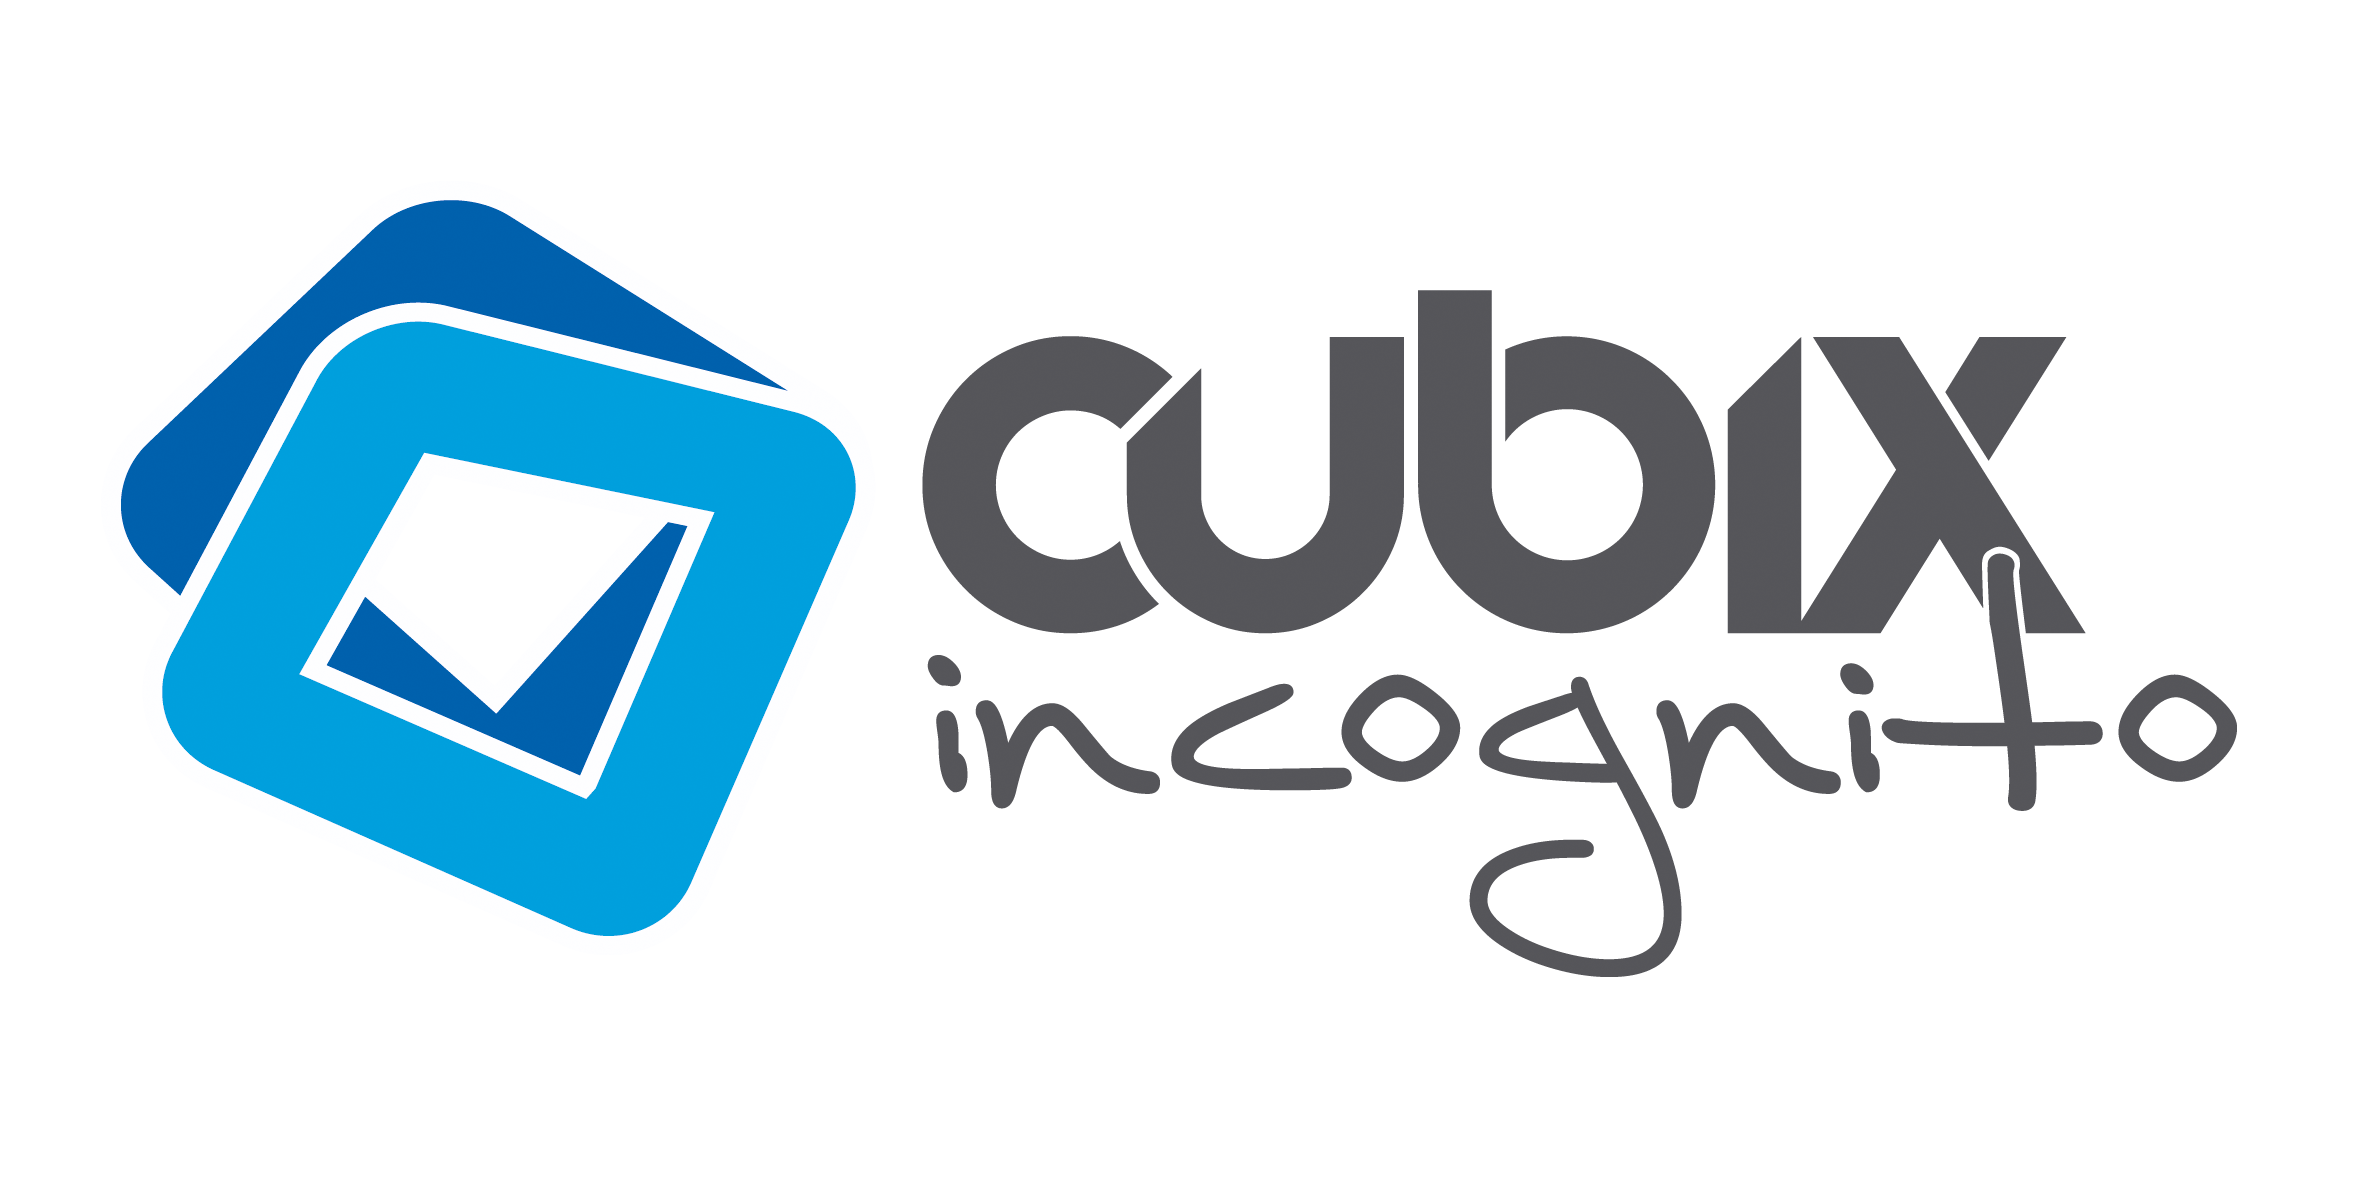 3 CUBIX incognito-LOGO-RGB